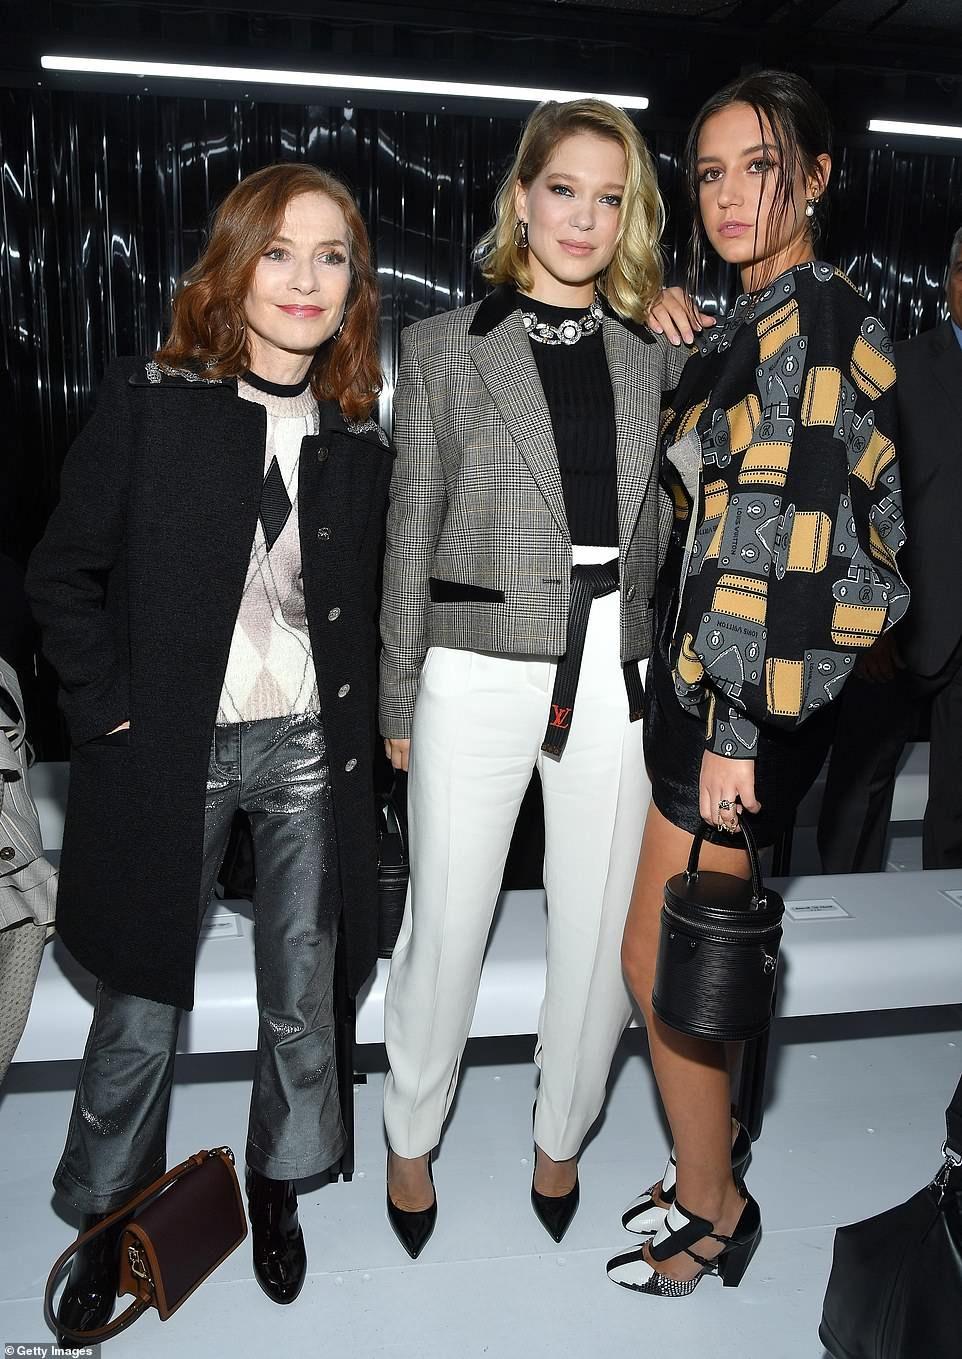 Sophie Turner Joins Fiance Joe Jonas At Louis Vuitton Pfw Show